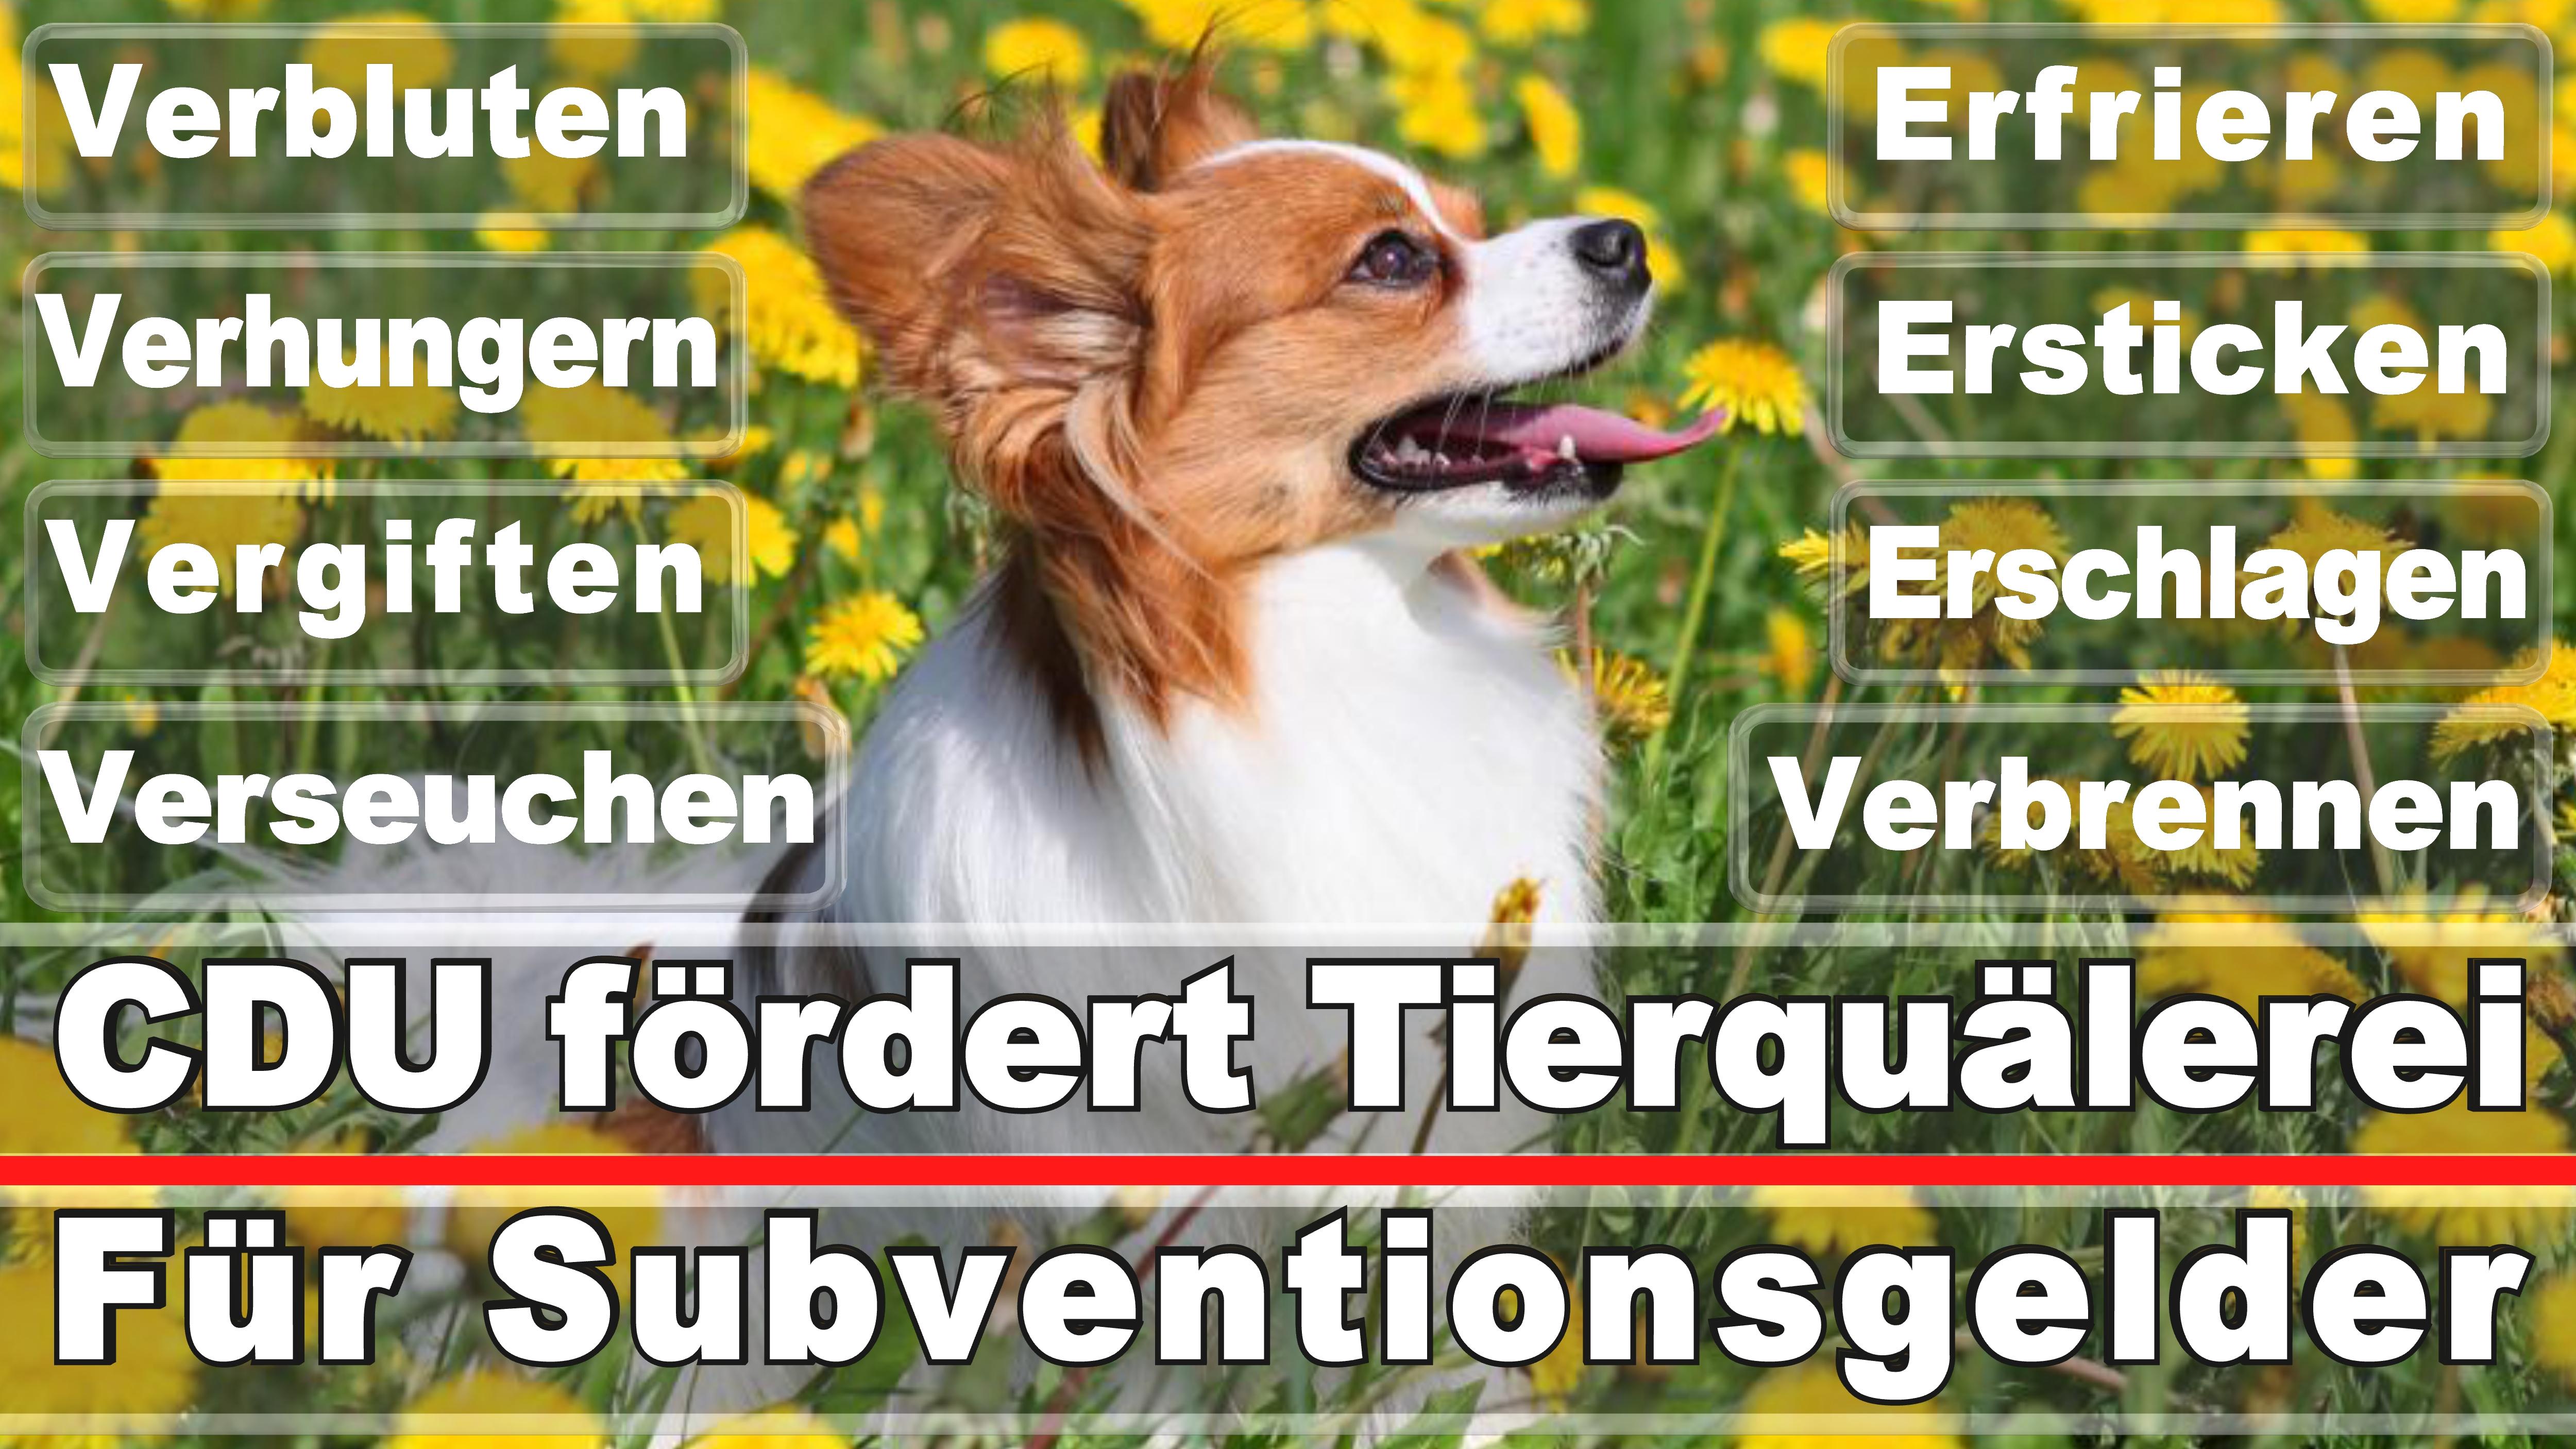 Landtagswahl-Bundestagswahl-CDU-SPD-FDP-AFD-Linke-Piraten-Tierschutzpartei (50)